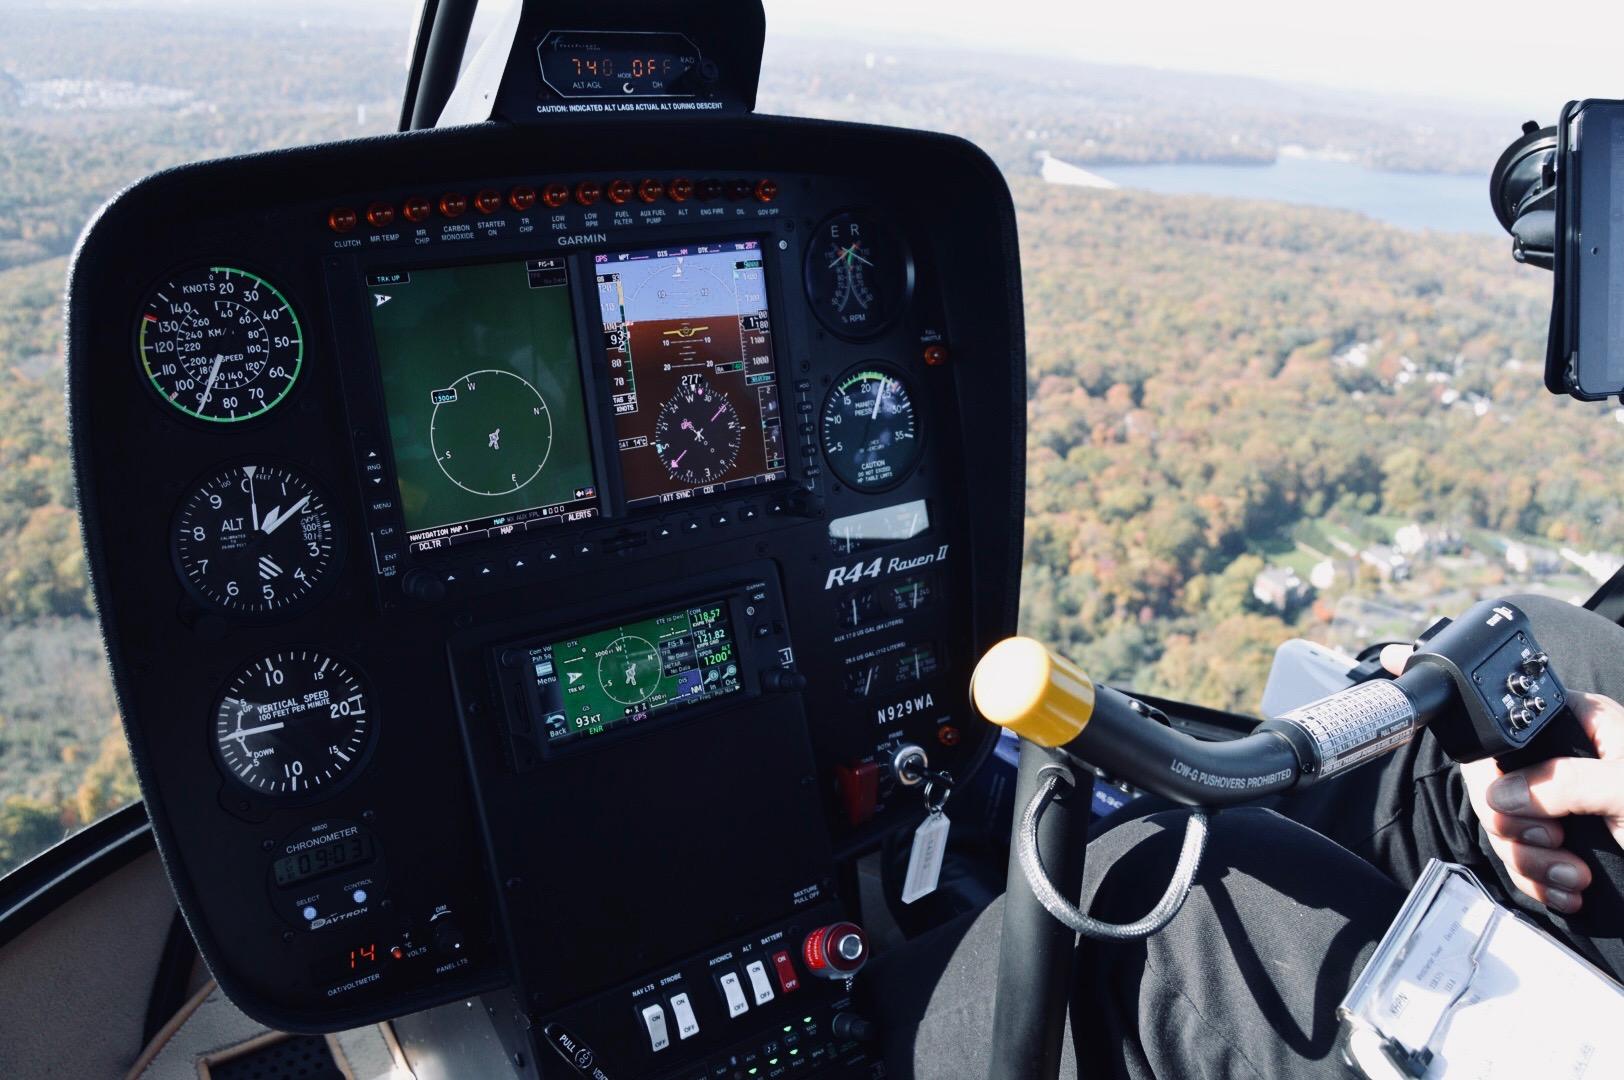 Inside of R44 Raven II Helicopter in flight training